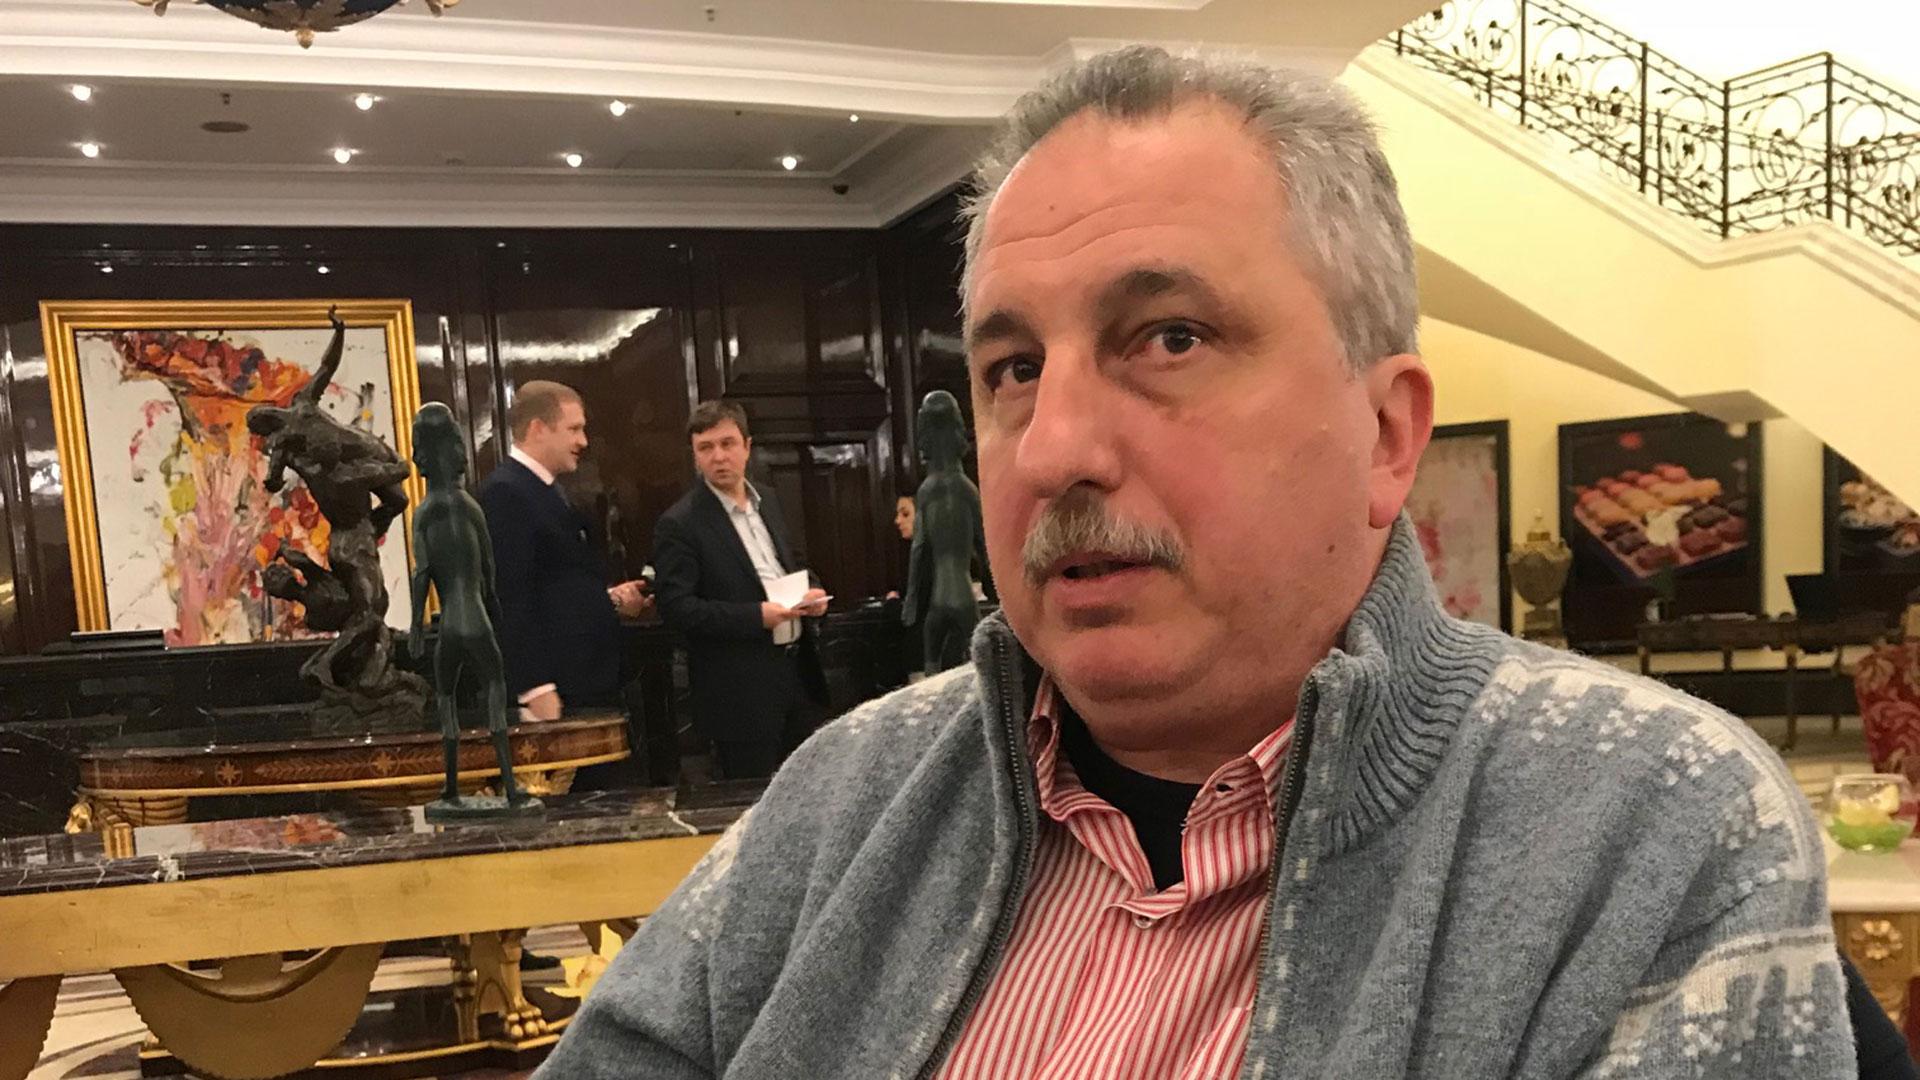 El gobernador de Misiones Hugo Passalacqua